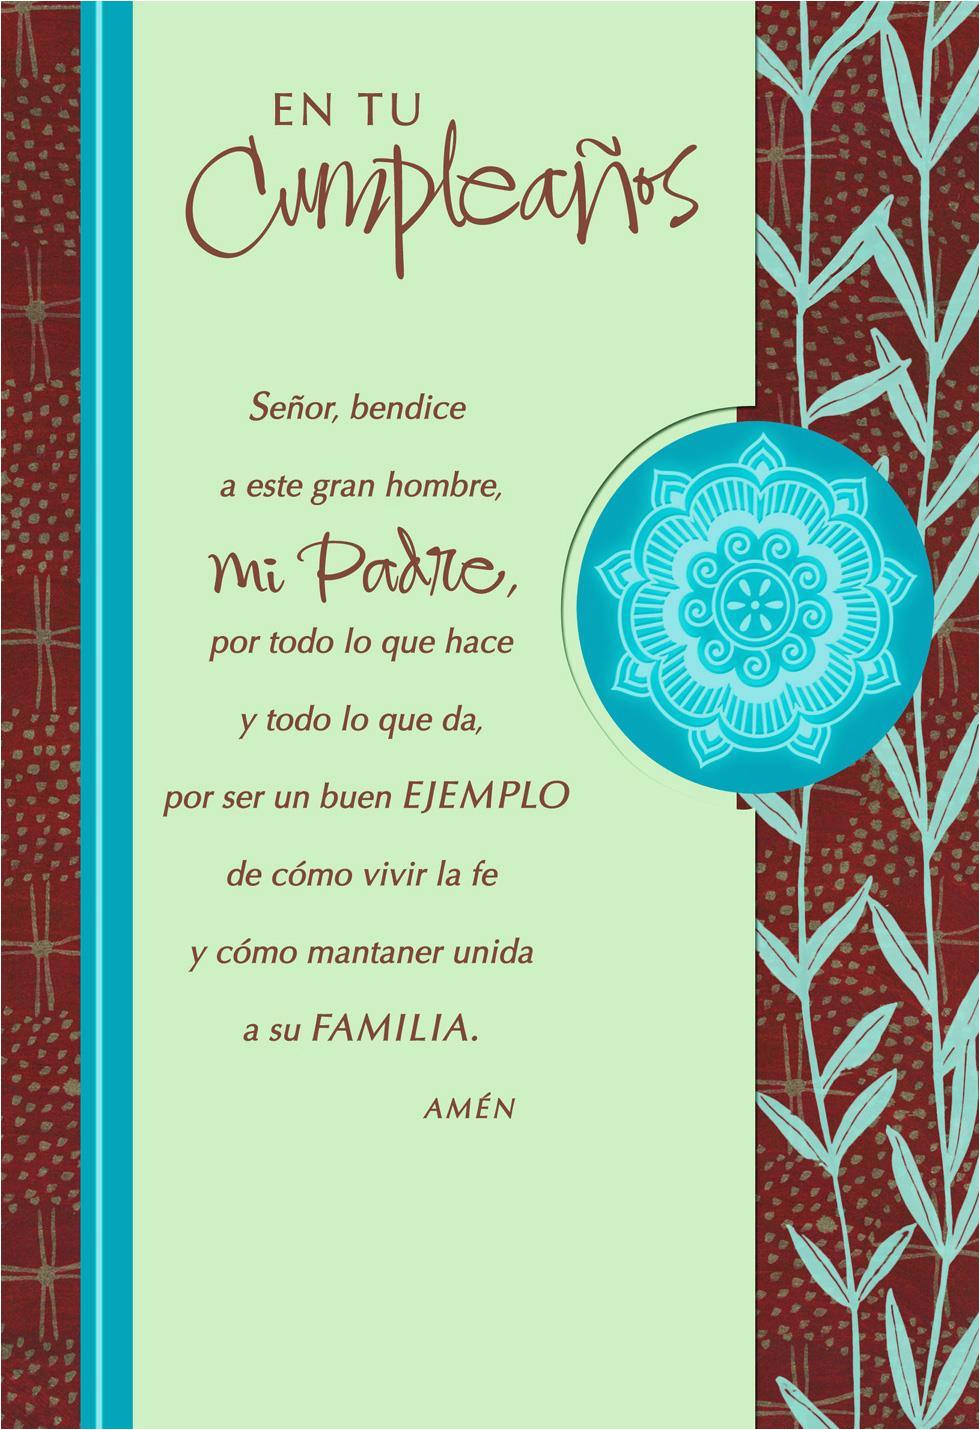 my prayer for you dad spanish language religious birthday card 299man2748